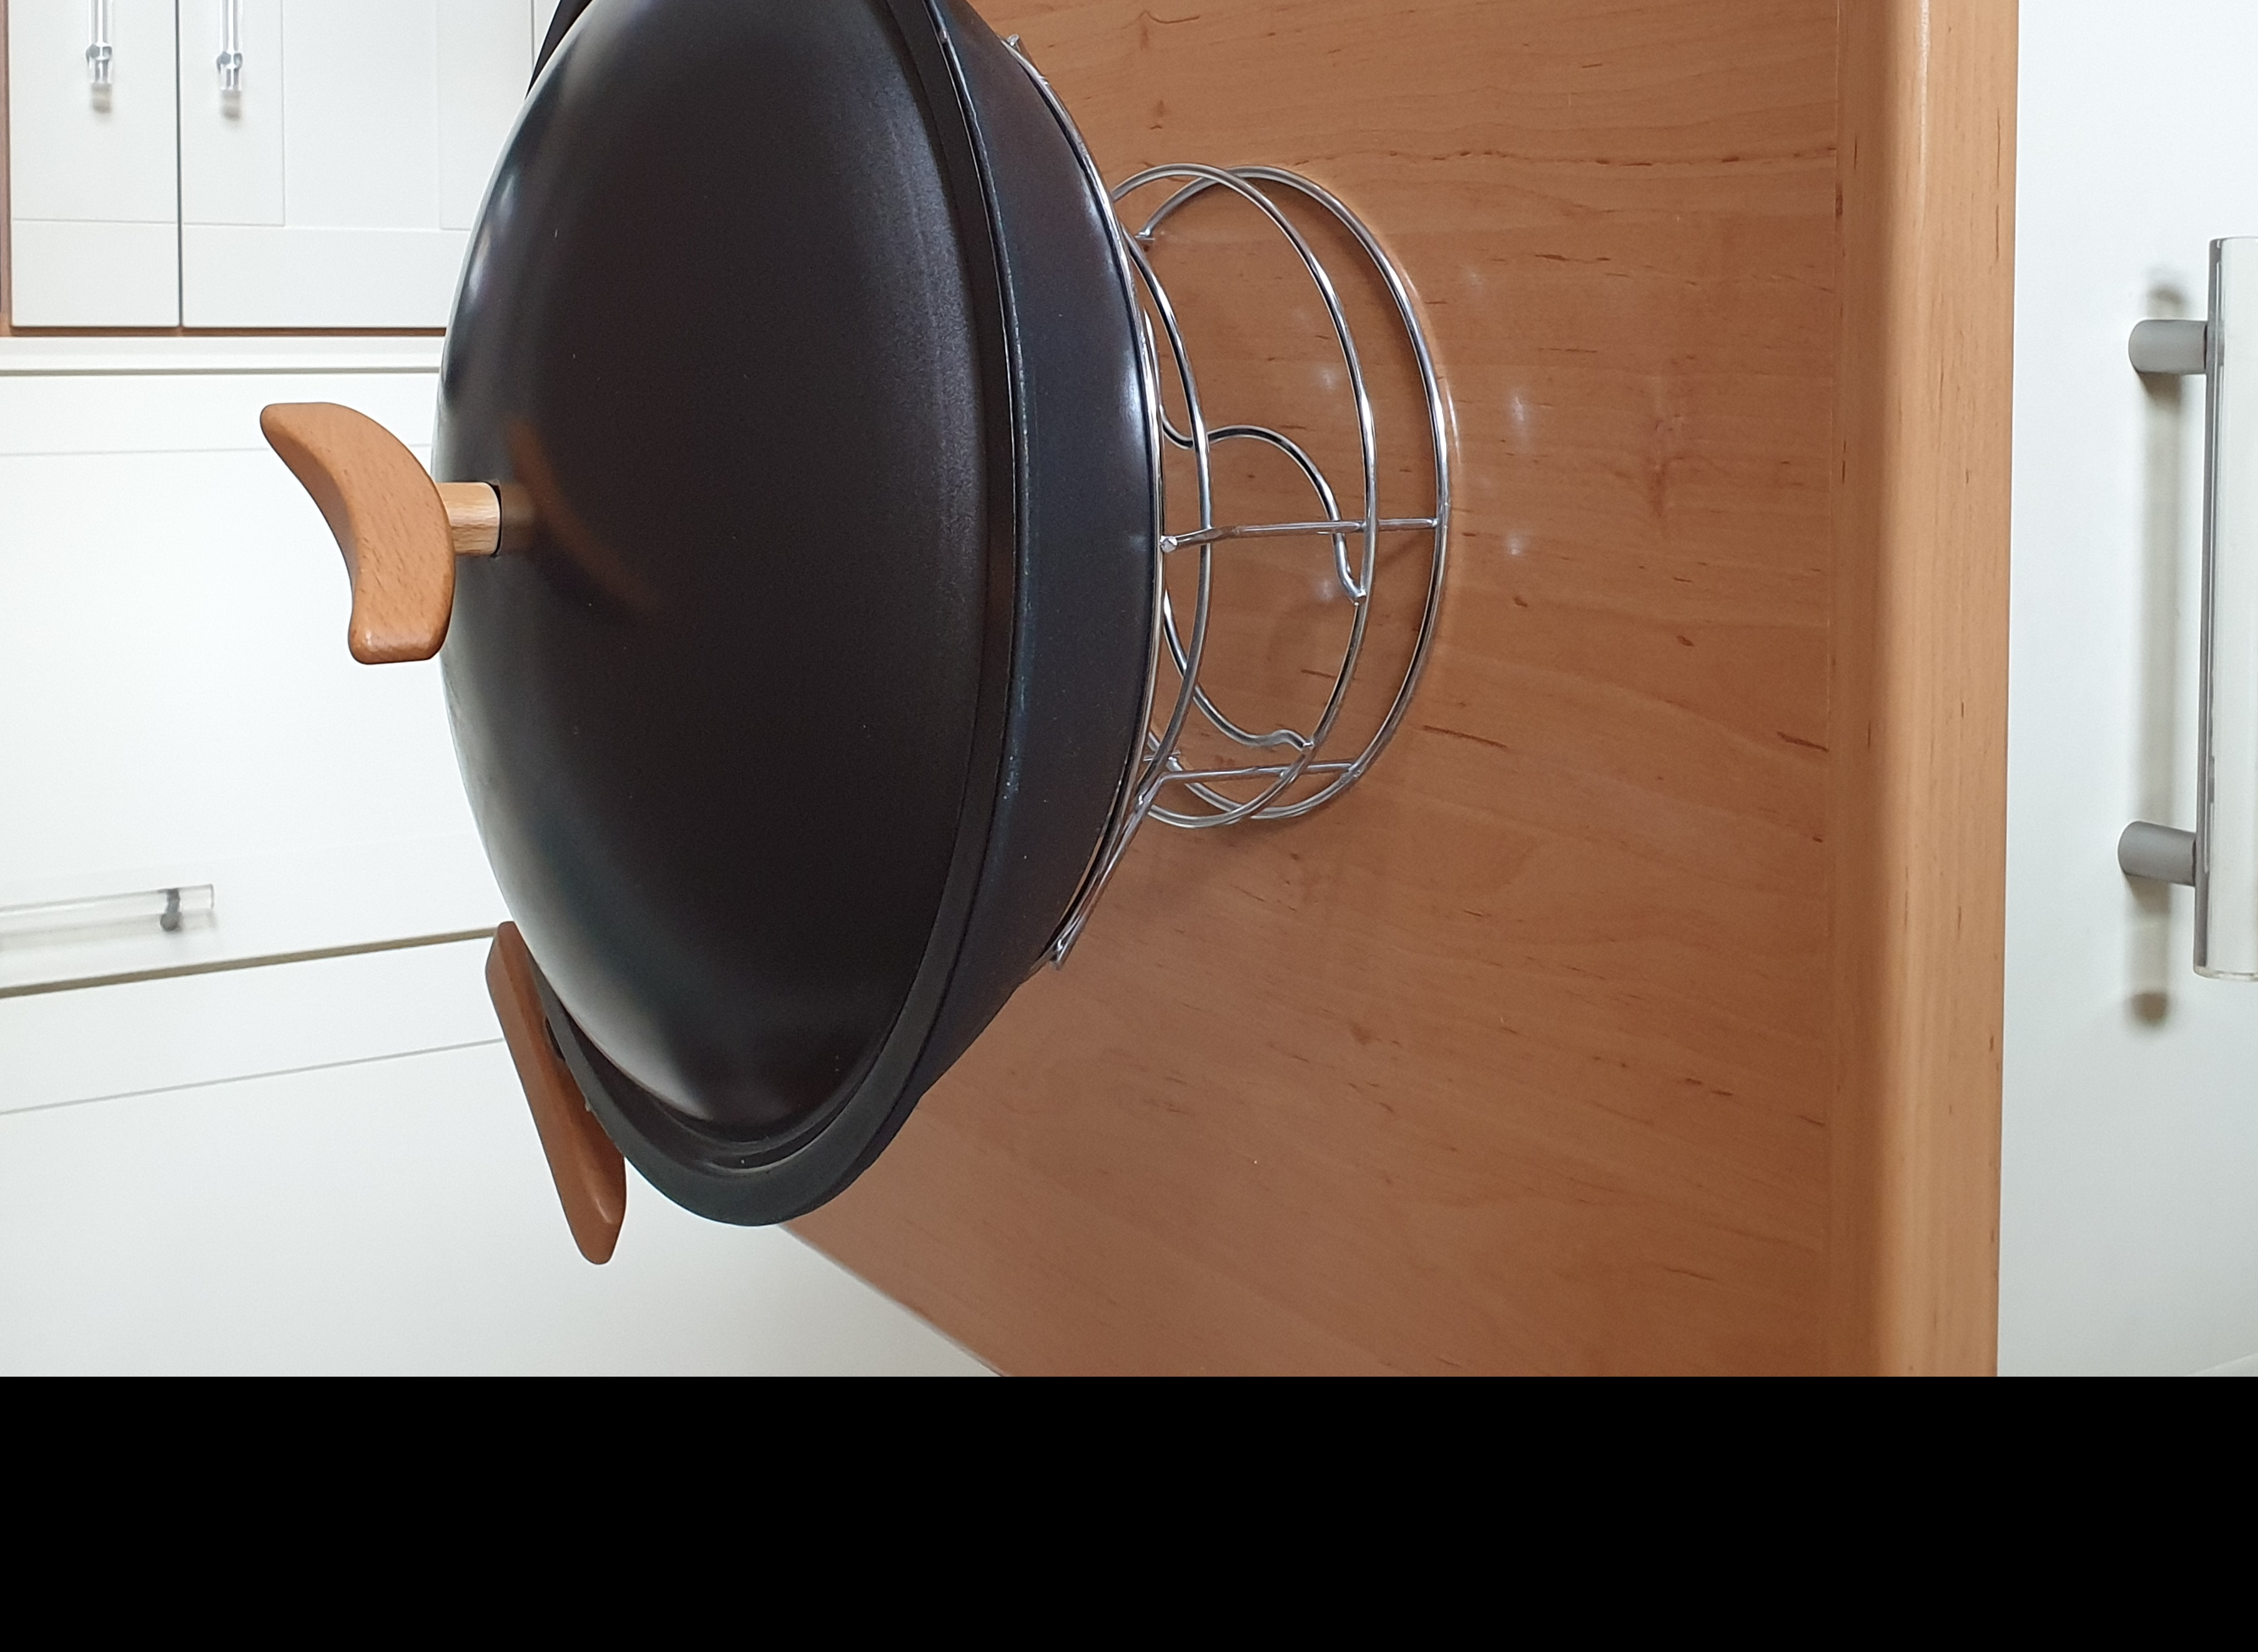 Guss-Wok Set Marke Spring, 5-tlg., 35 cm, 4 l, gebraucht